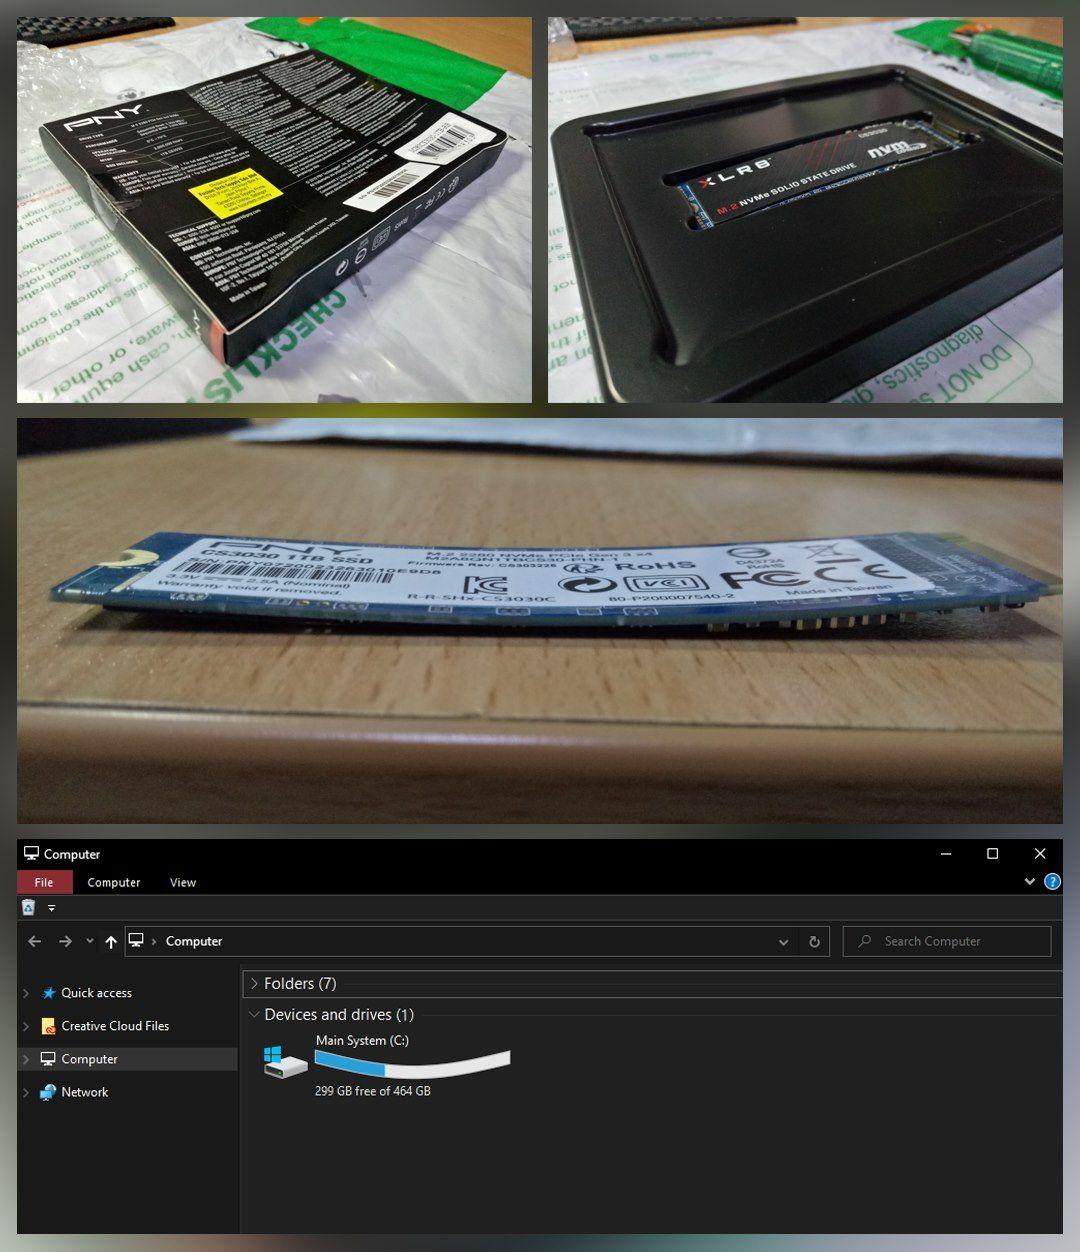 Flexing my new SSD